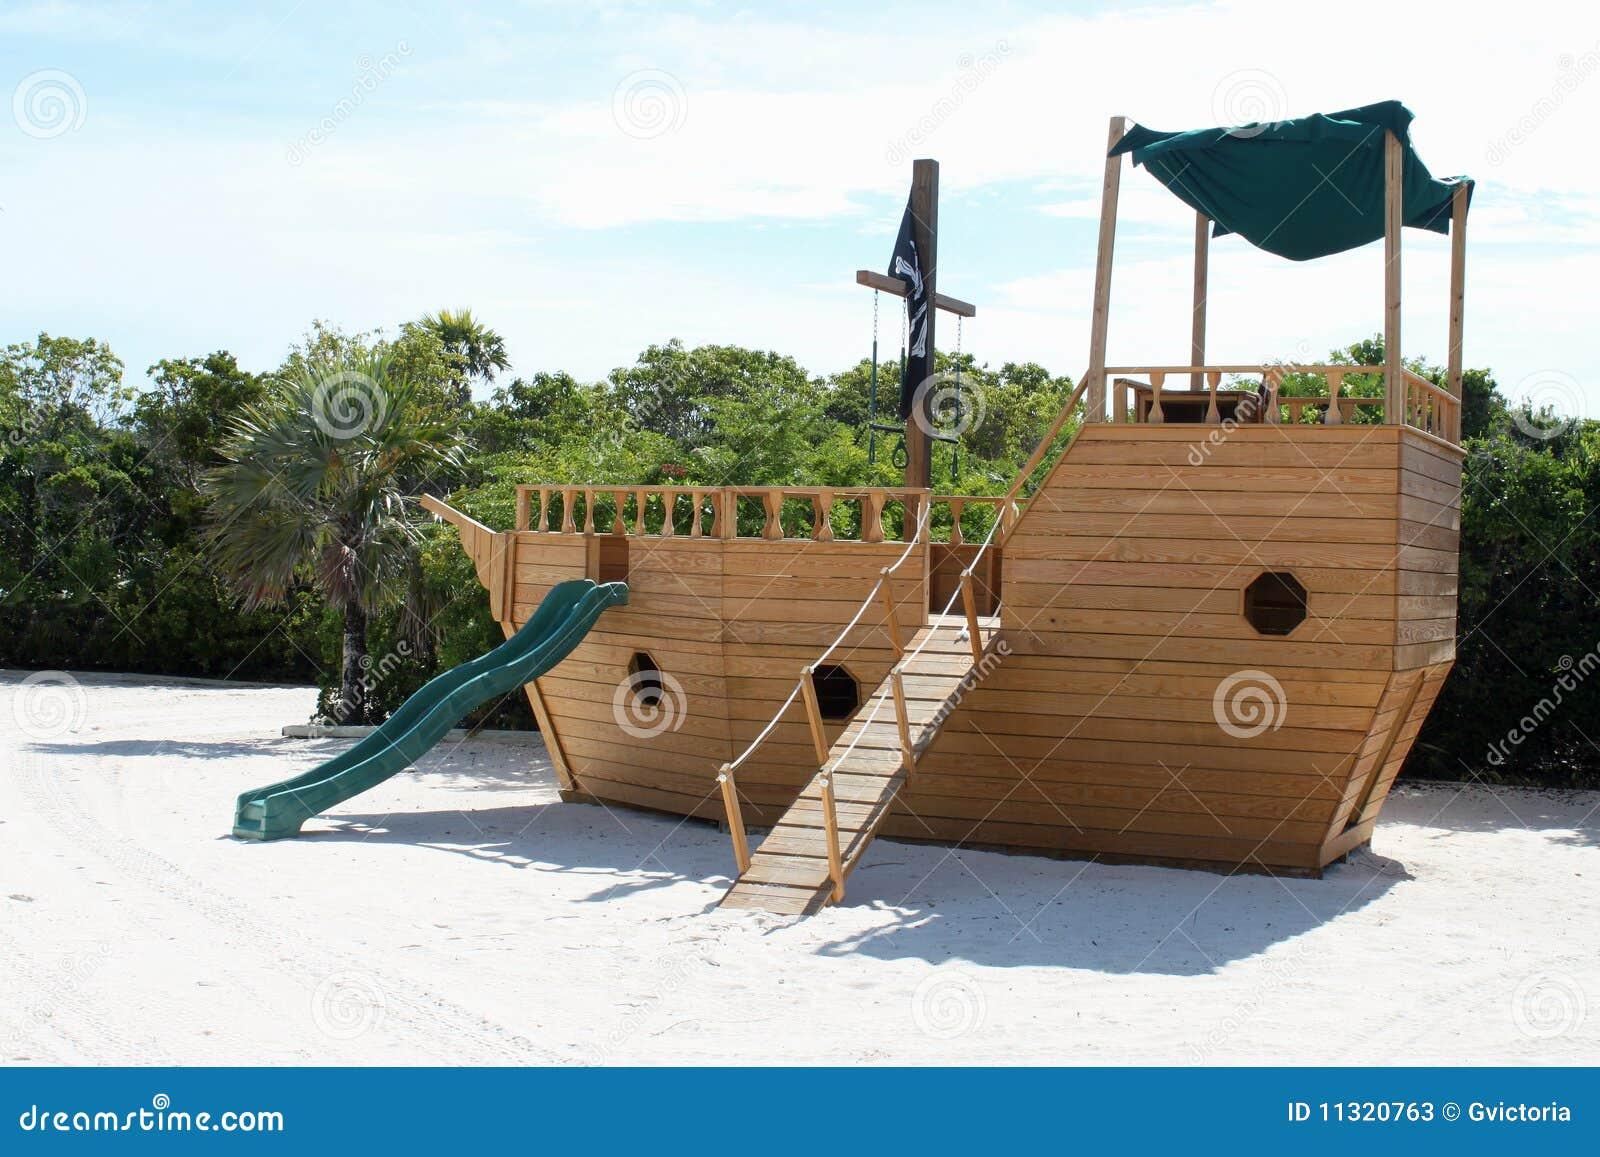 cour de jeu de glissi re de bateau de pirate photos stock. Black Bedroom Furniture Sets. Home Design Ideas